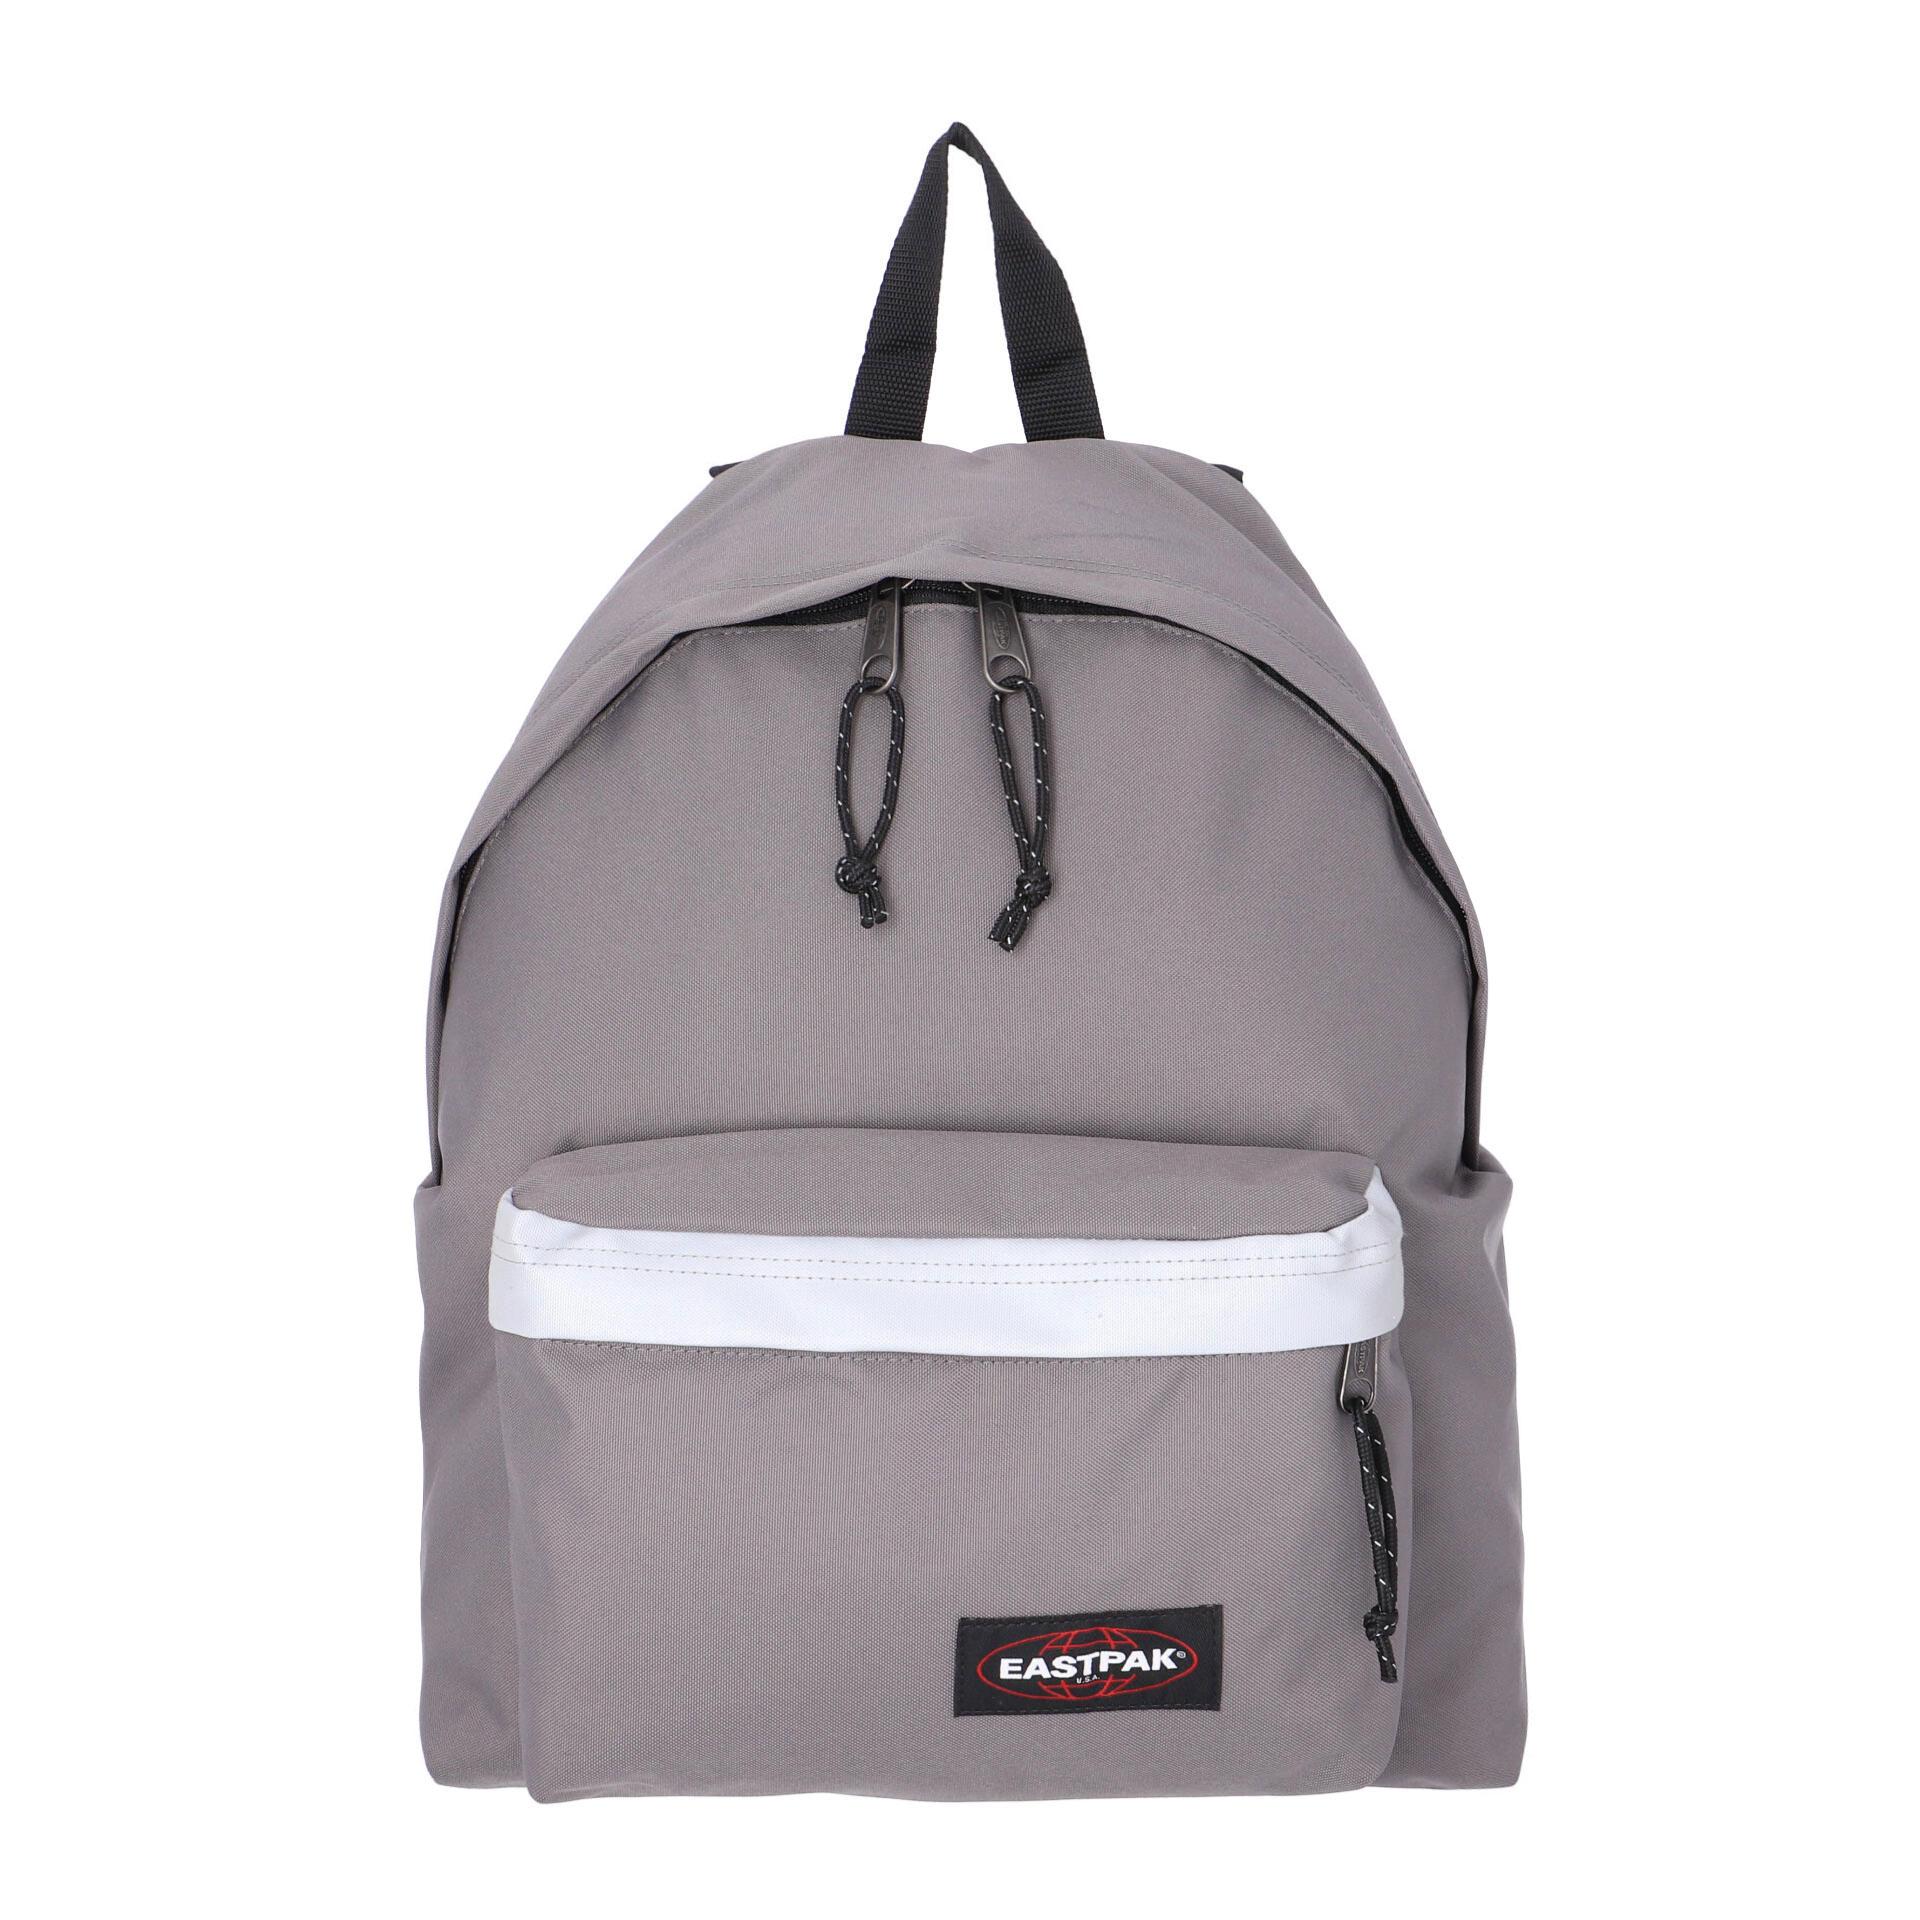 Eastpak Selection Padded Pak'r Rucksack mit Reflektorstreifen reflective grey